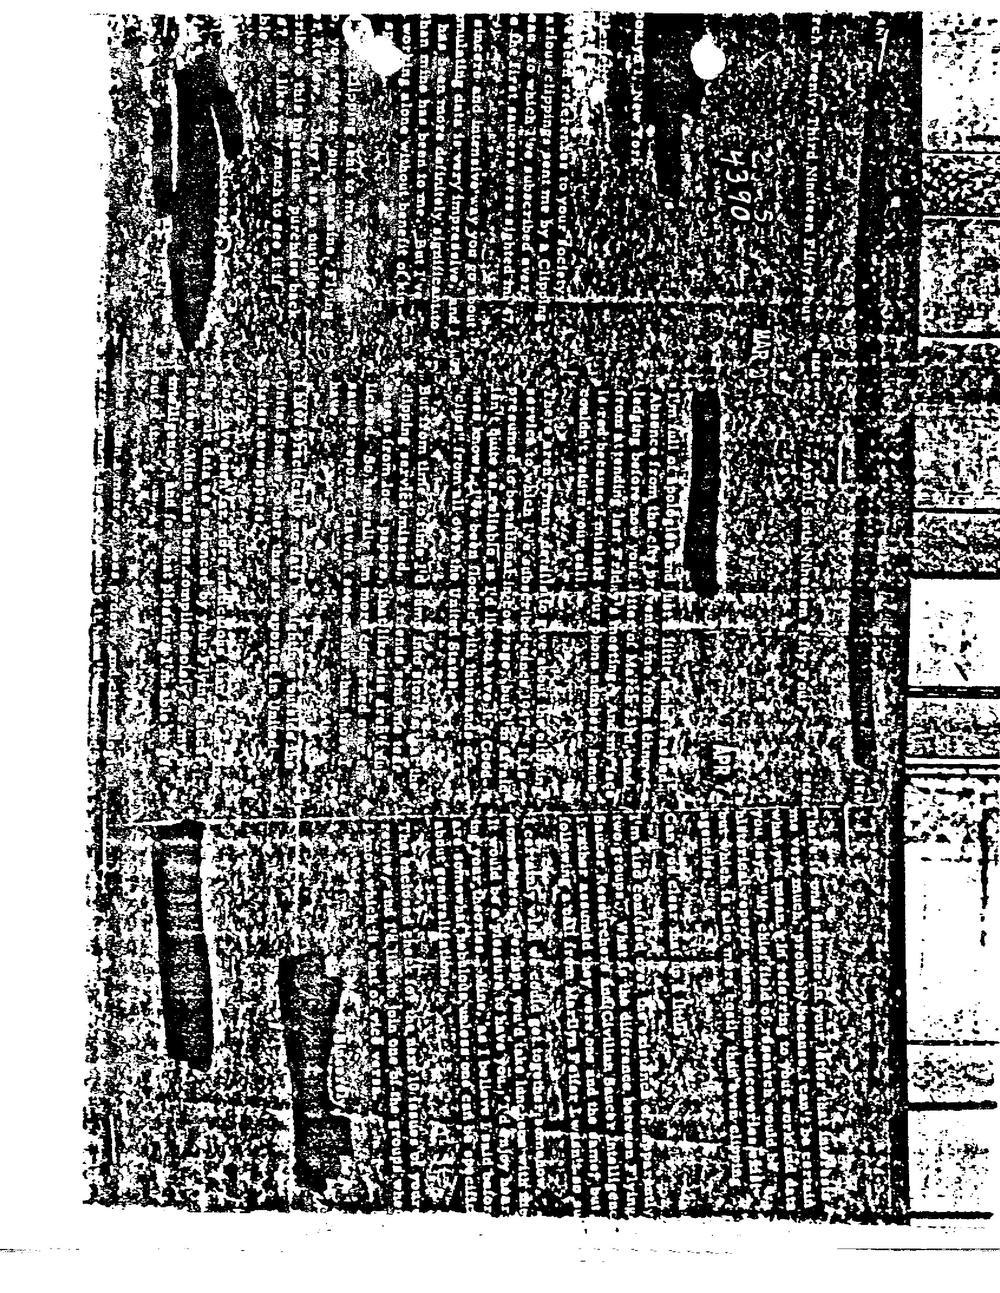 6-C-page-013.jpg